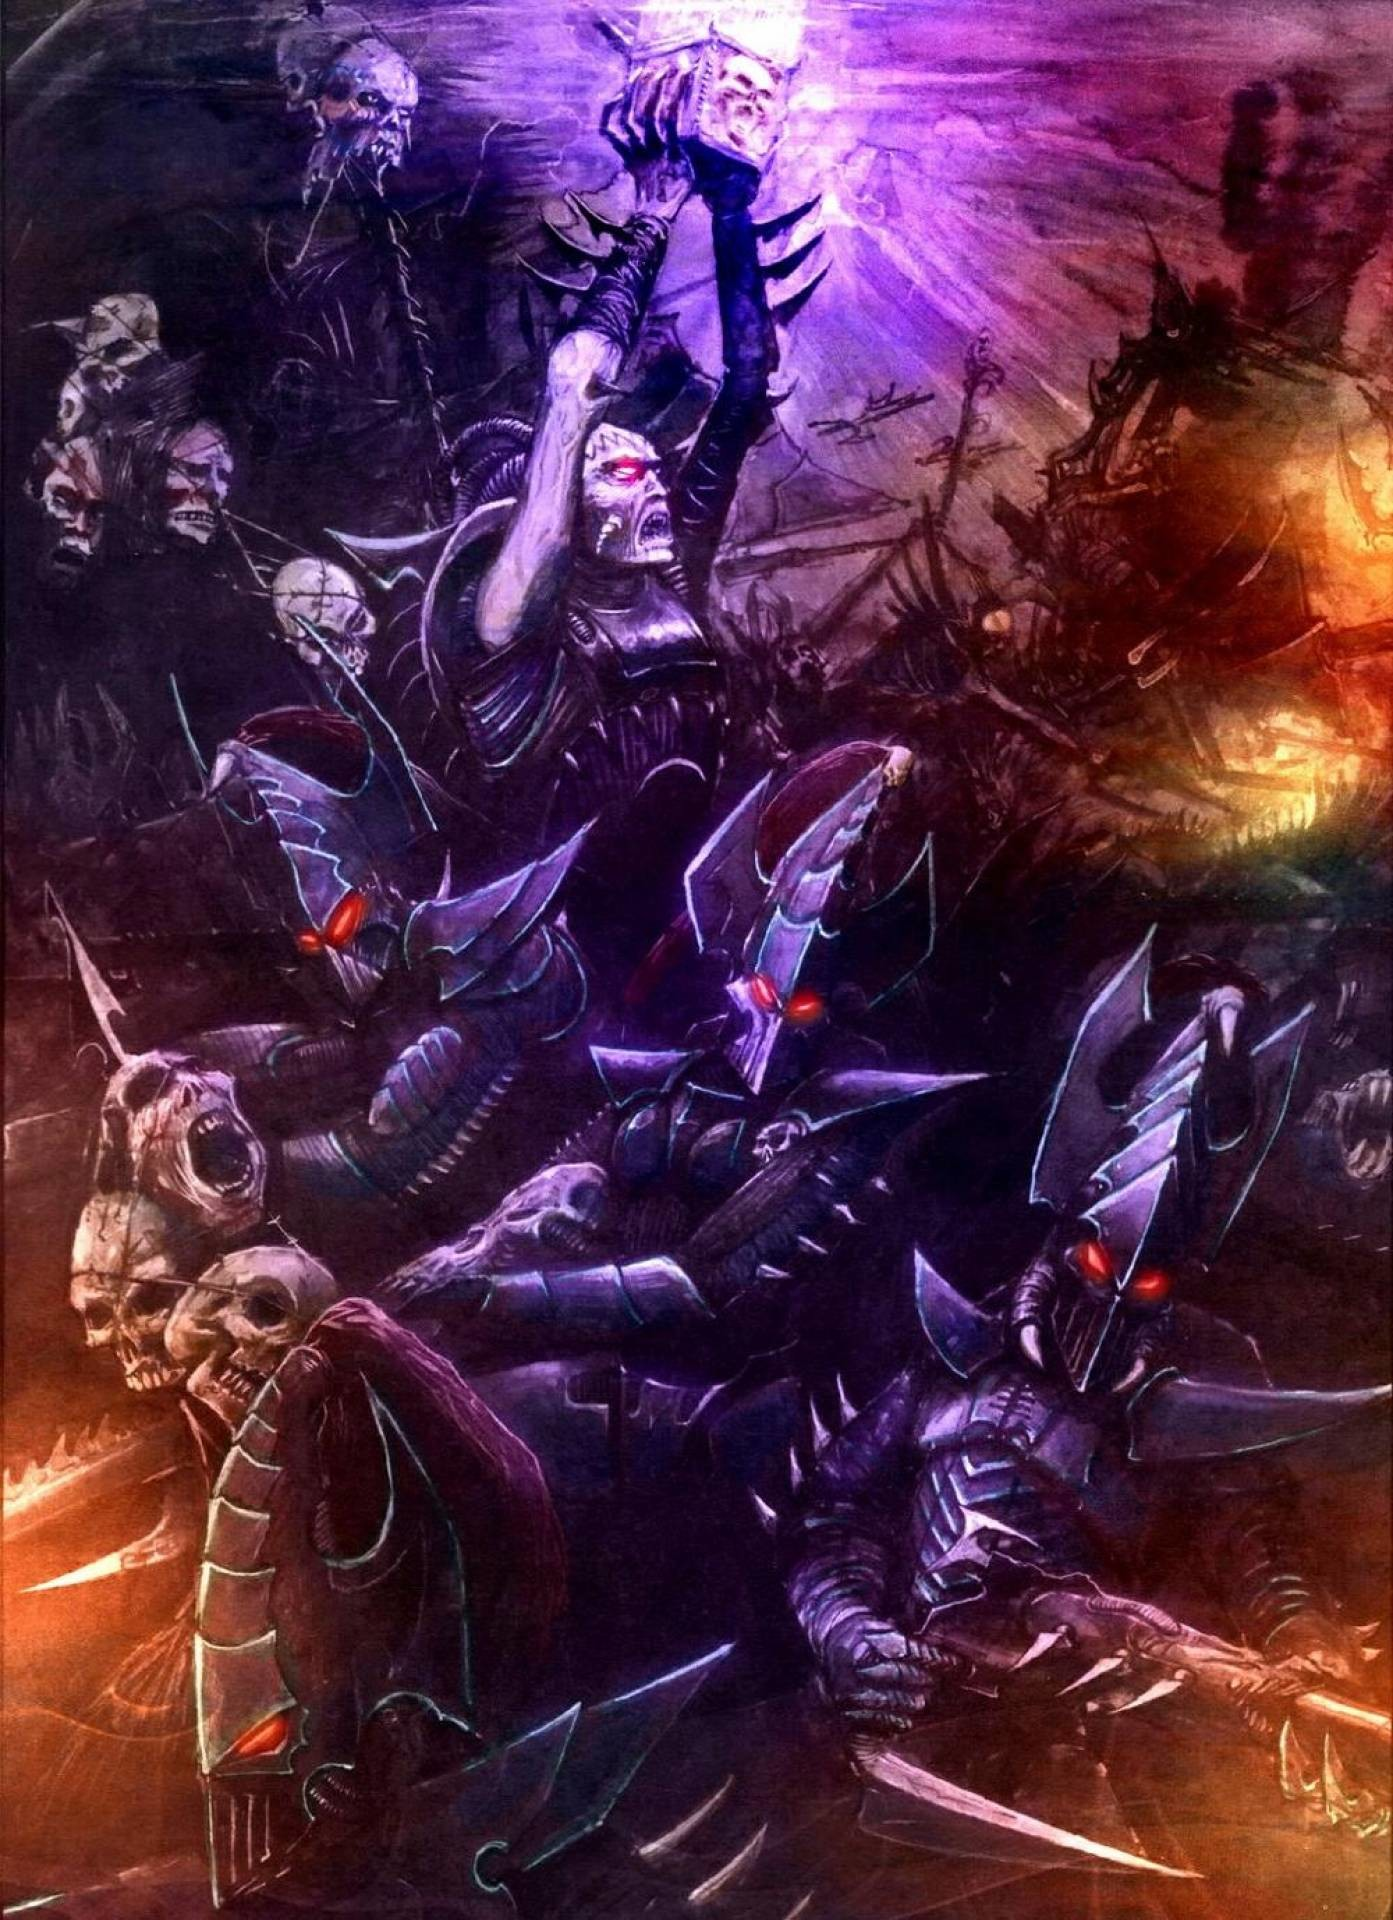 Warsmith Housou from the Iron Warriors Dark Eldar